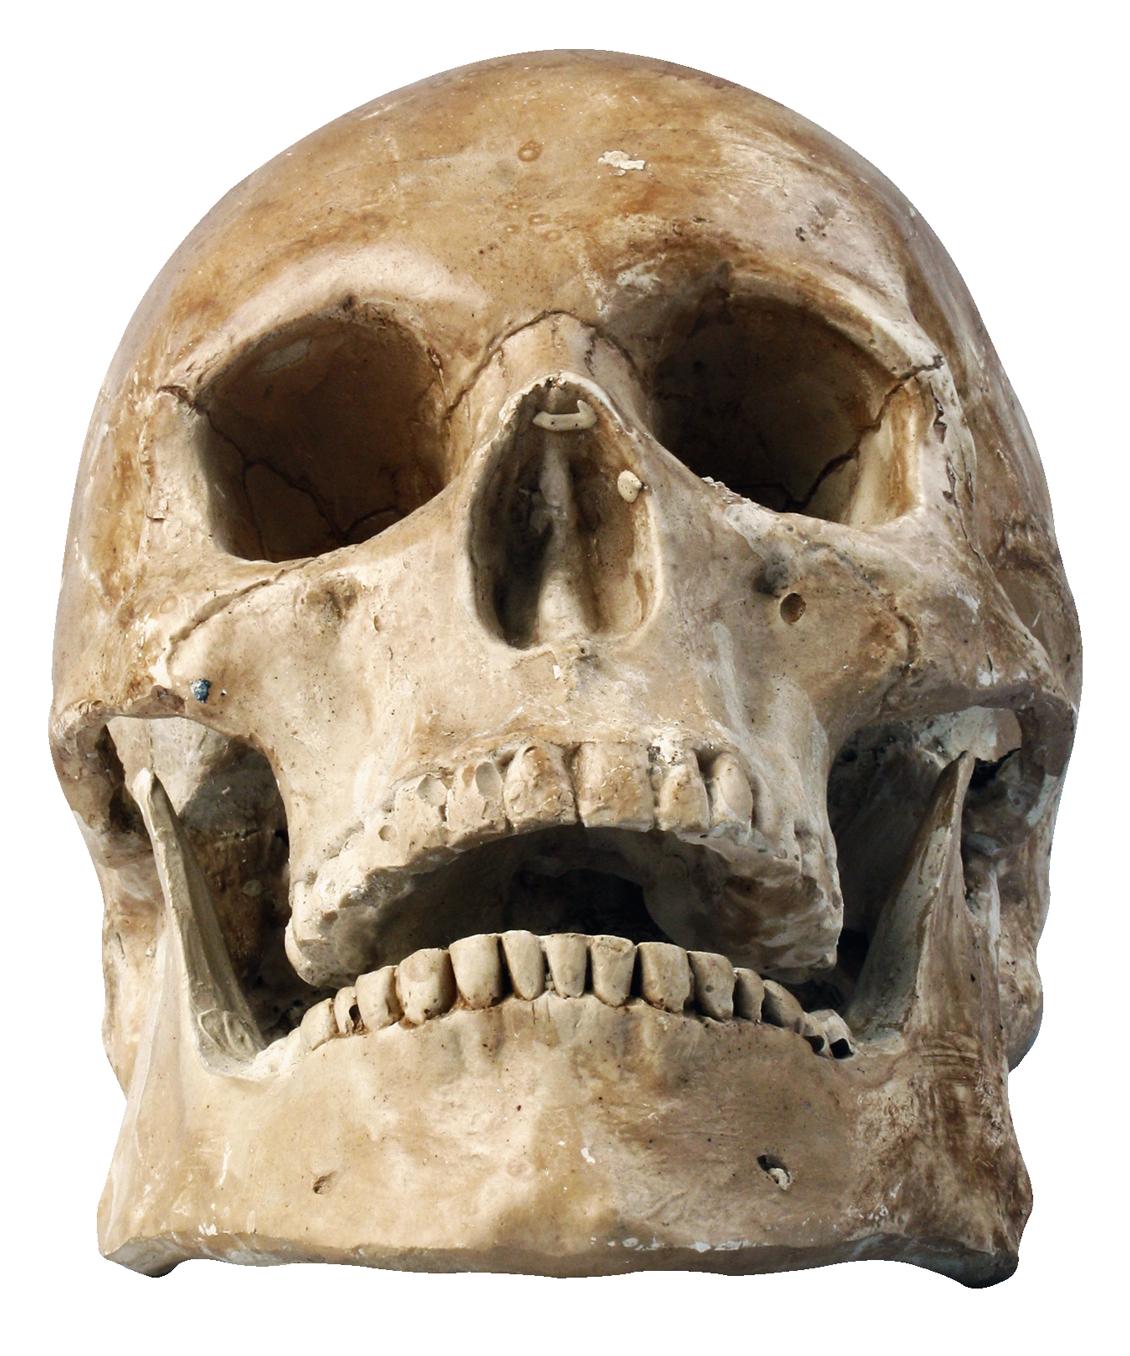 Skull Png Transparent Image - Skeleton Head, Transparent background PNG HD thumbnail